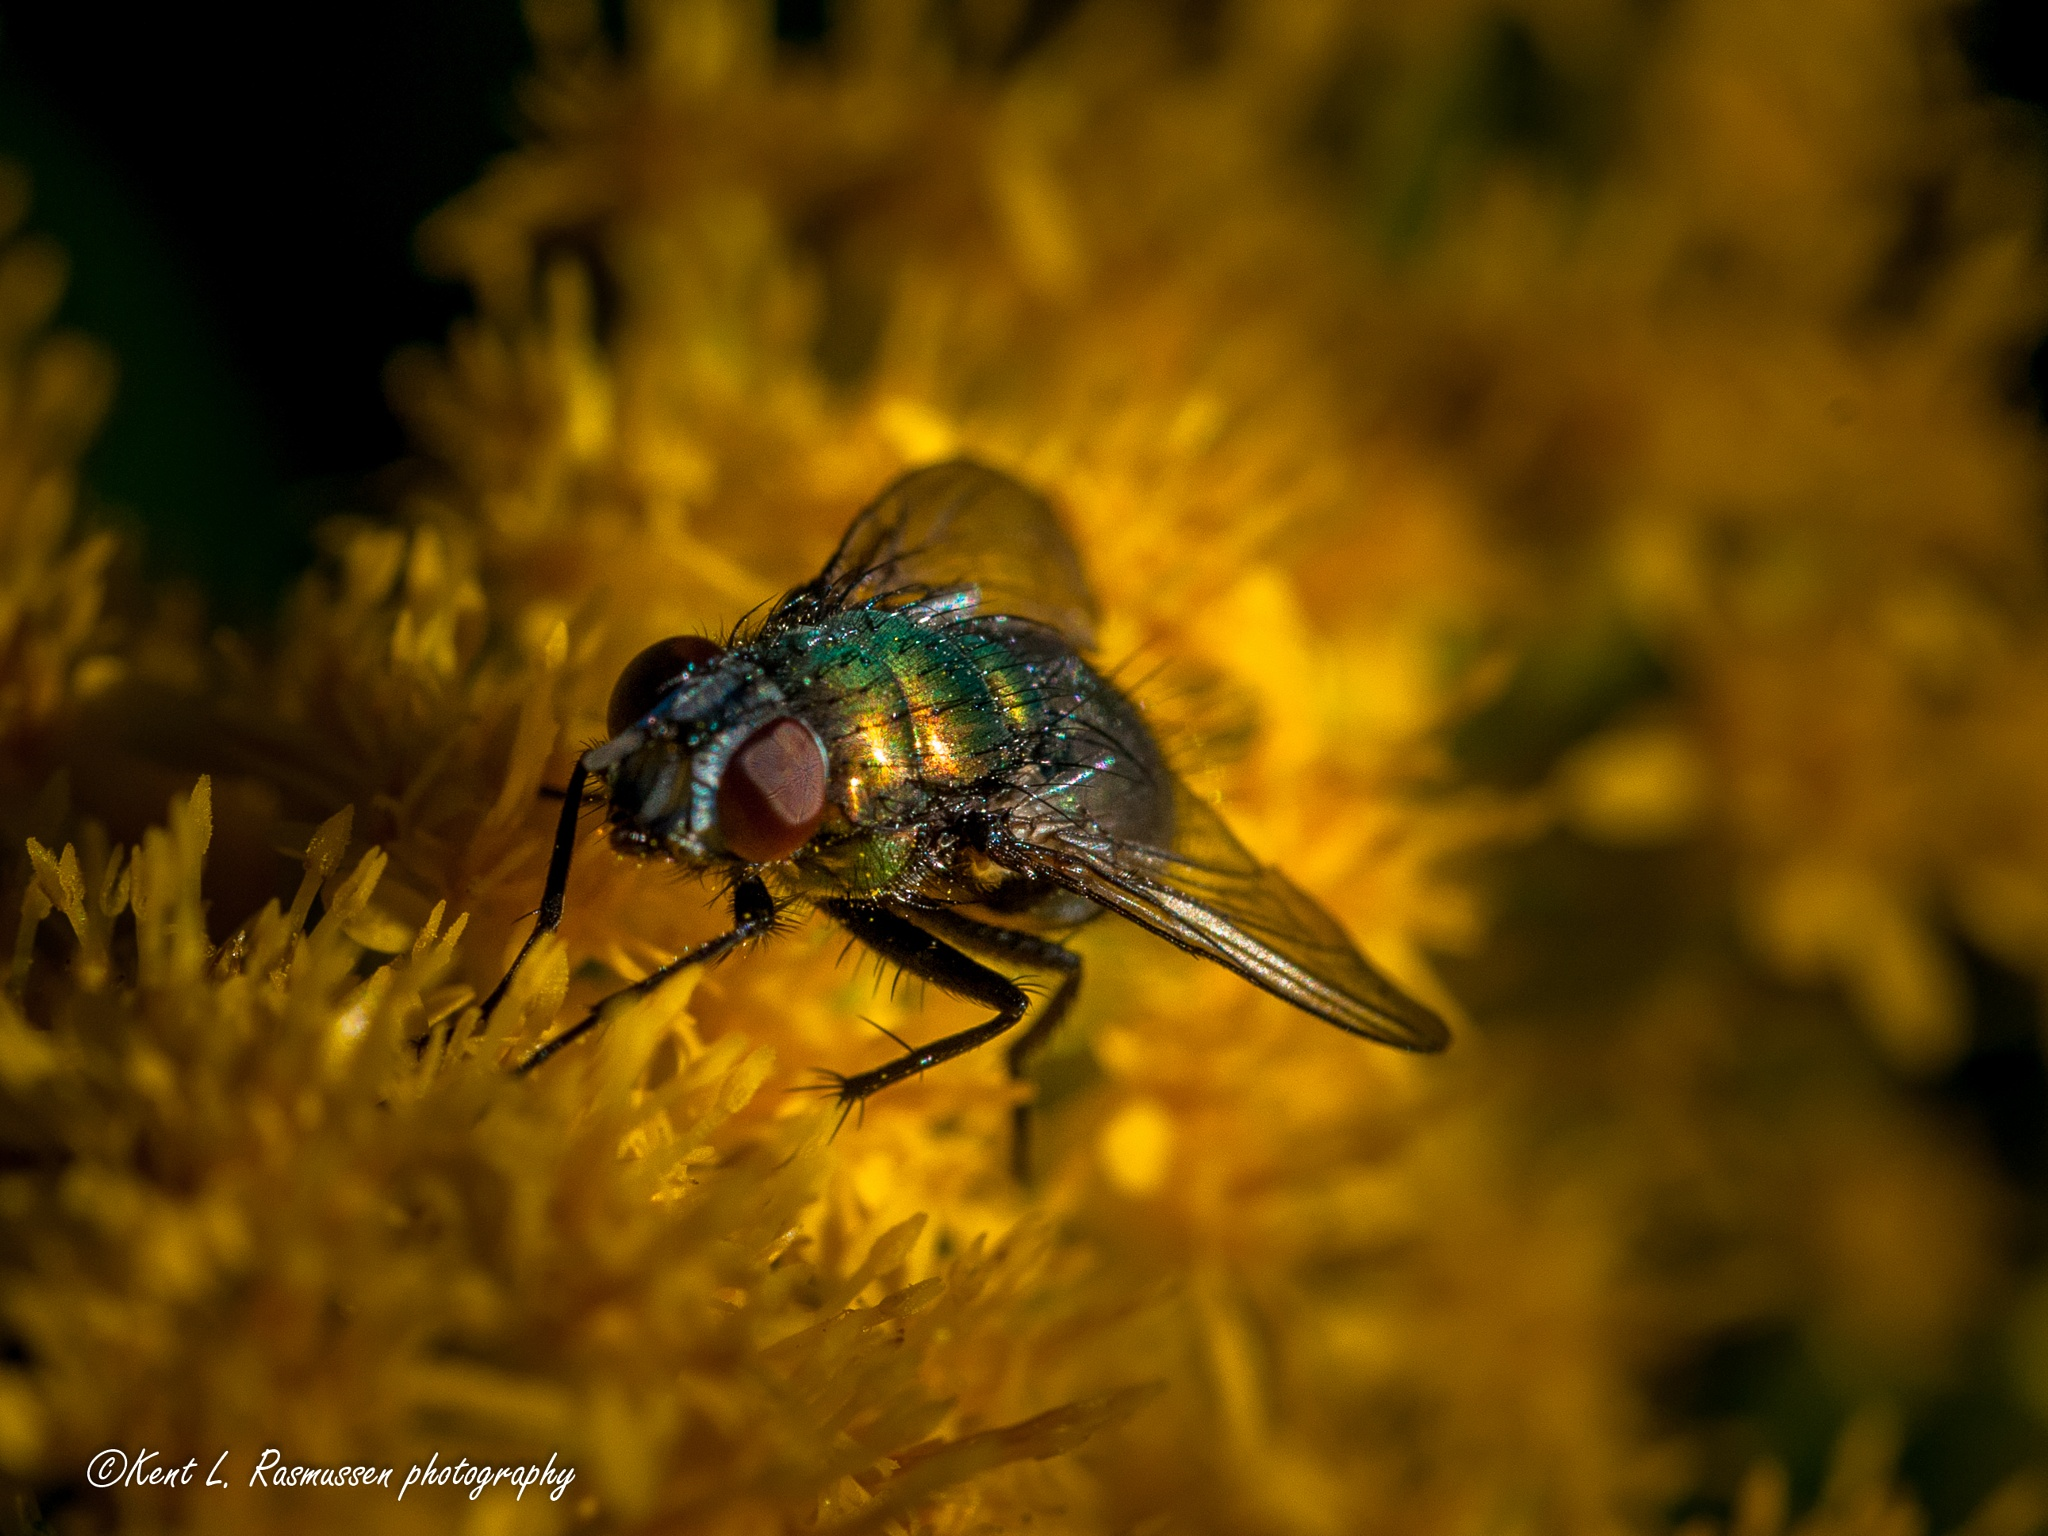 Golden green fly on a wild yellow flower by Kent L. Rasmussen